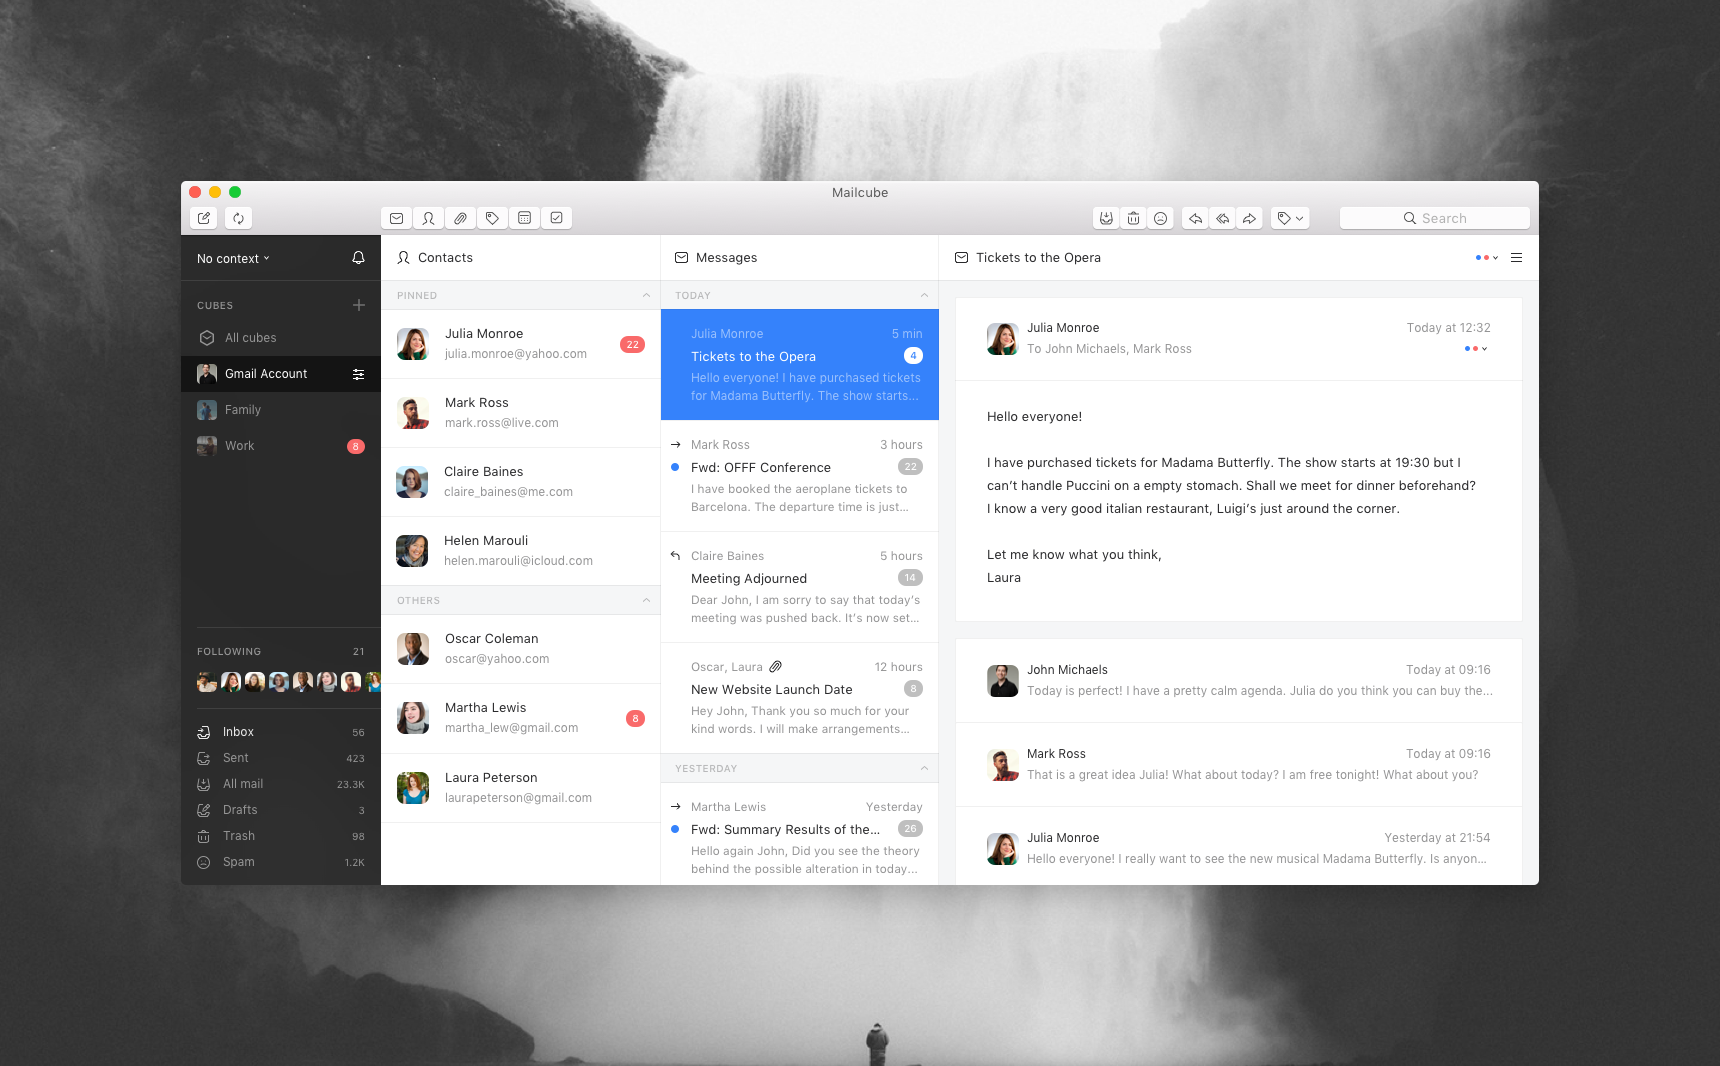 Mailcube app complete